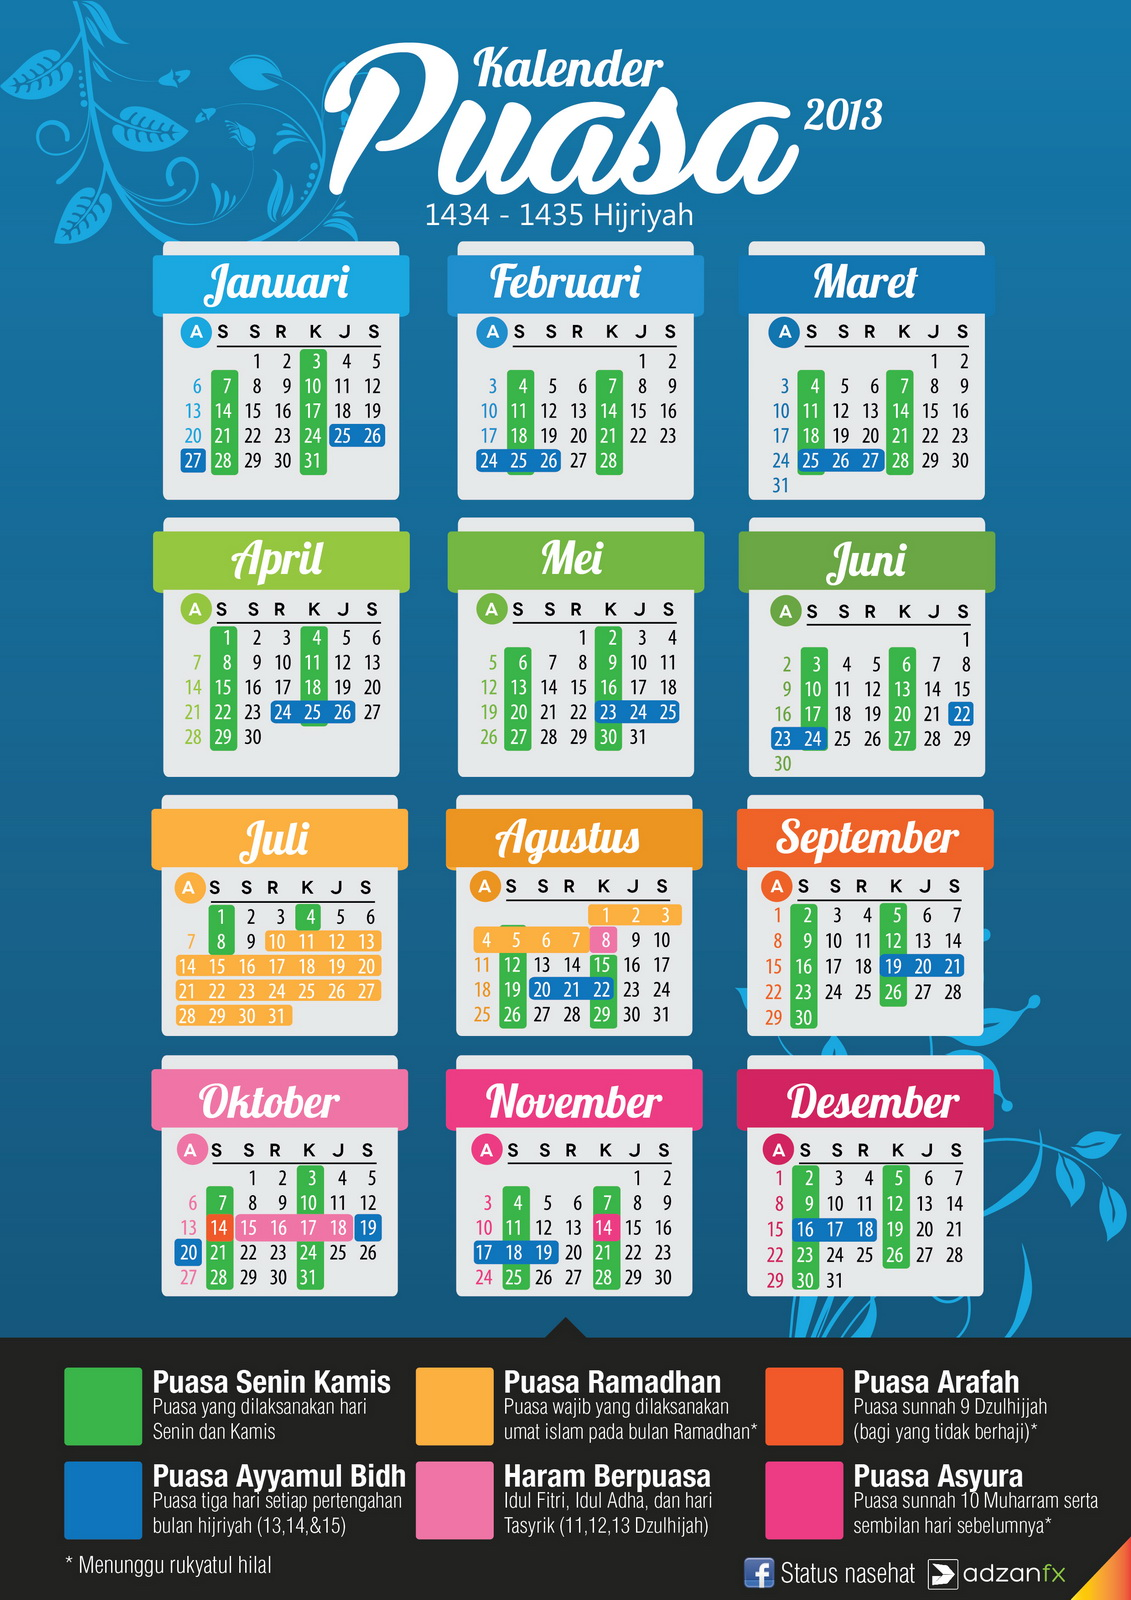 Kalender Puasa 2015